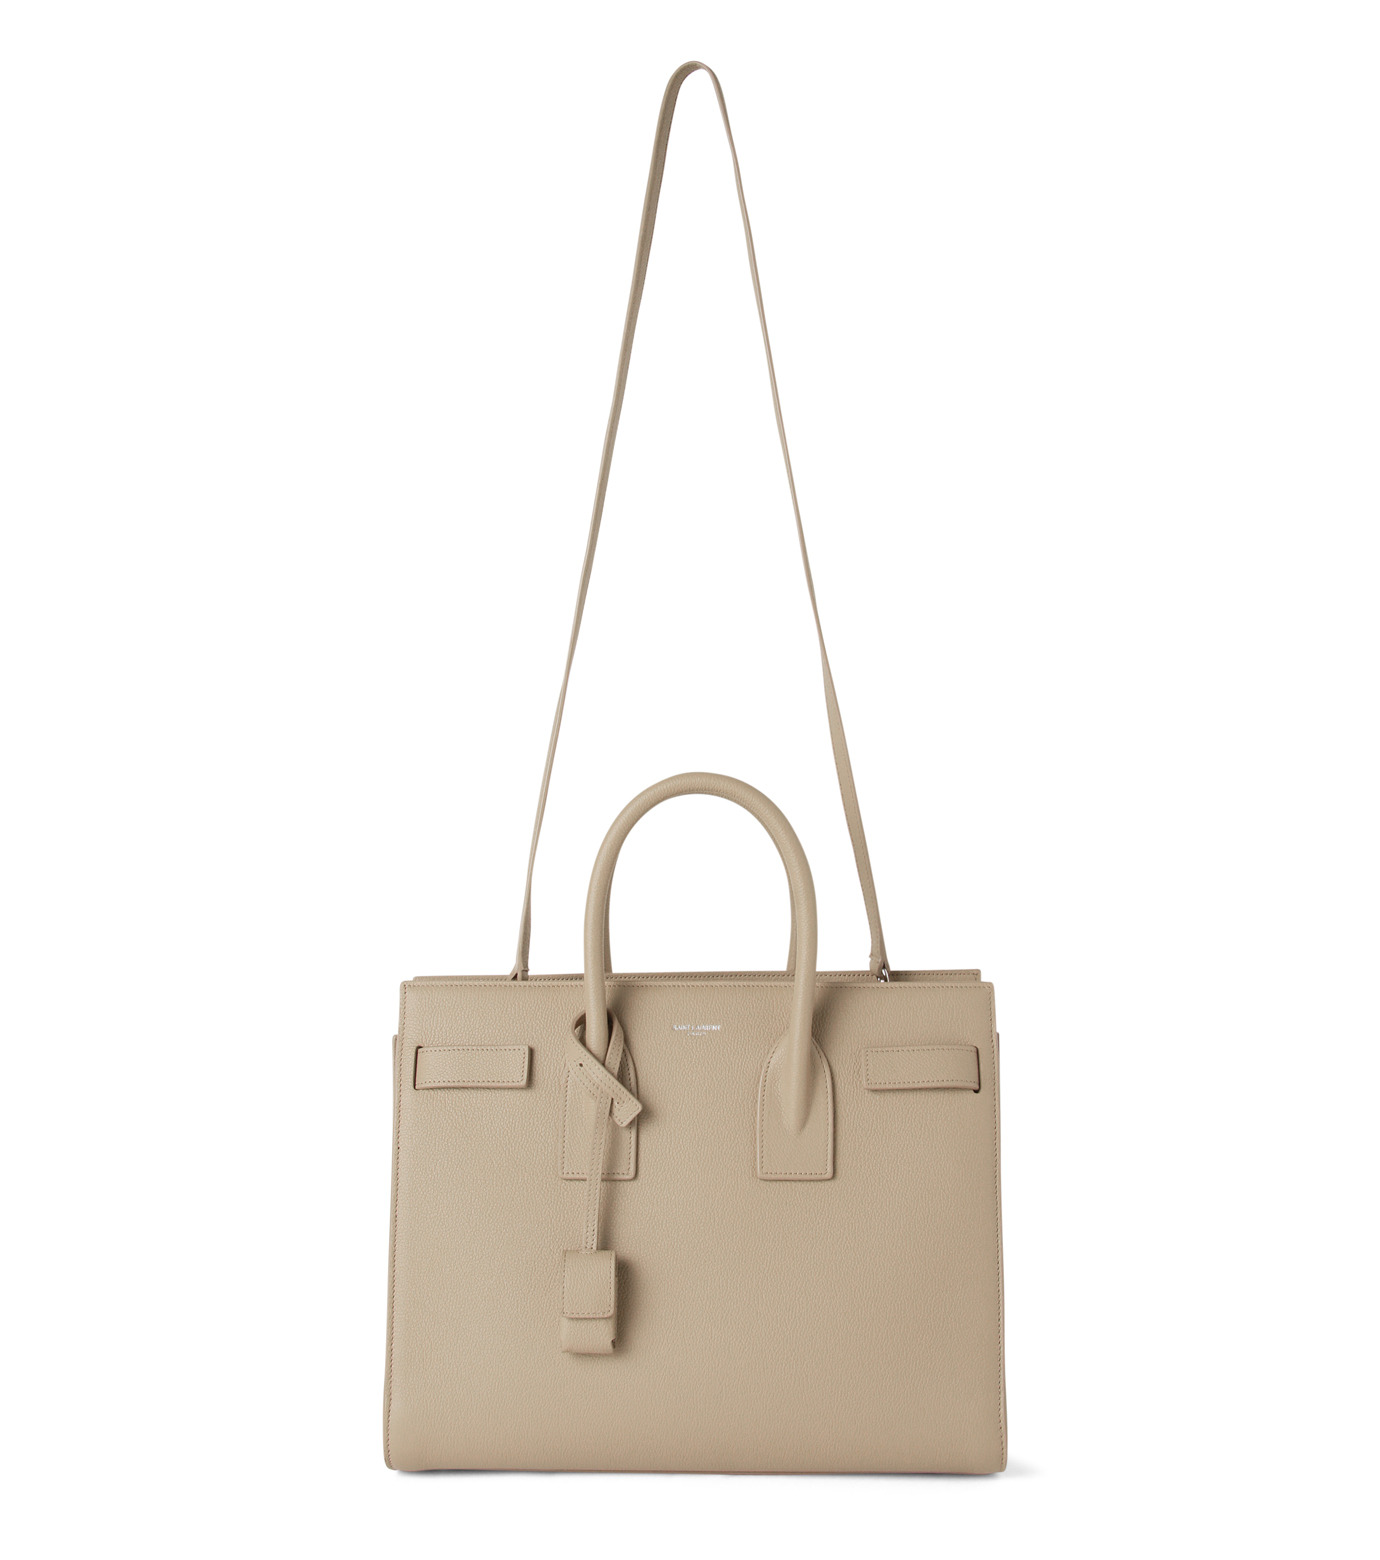 SAINT LAURENT(サンローラン)のSac de Jour Small-BEIGE(ハンドバッグ/hand bag)-398709-B680N-52 拡大詳細画像1